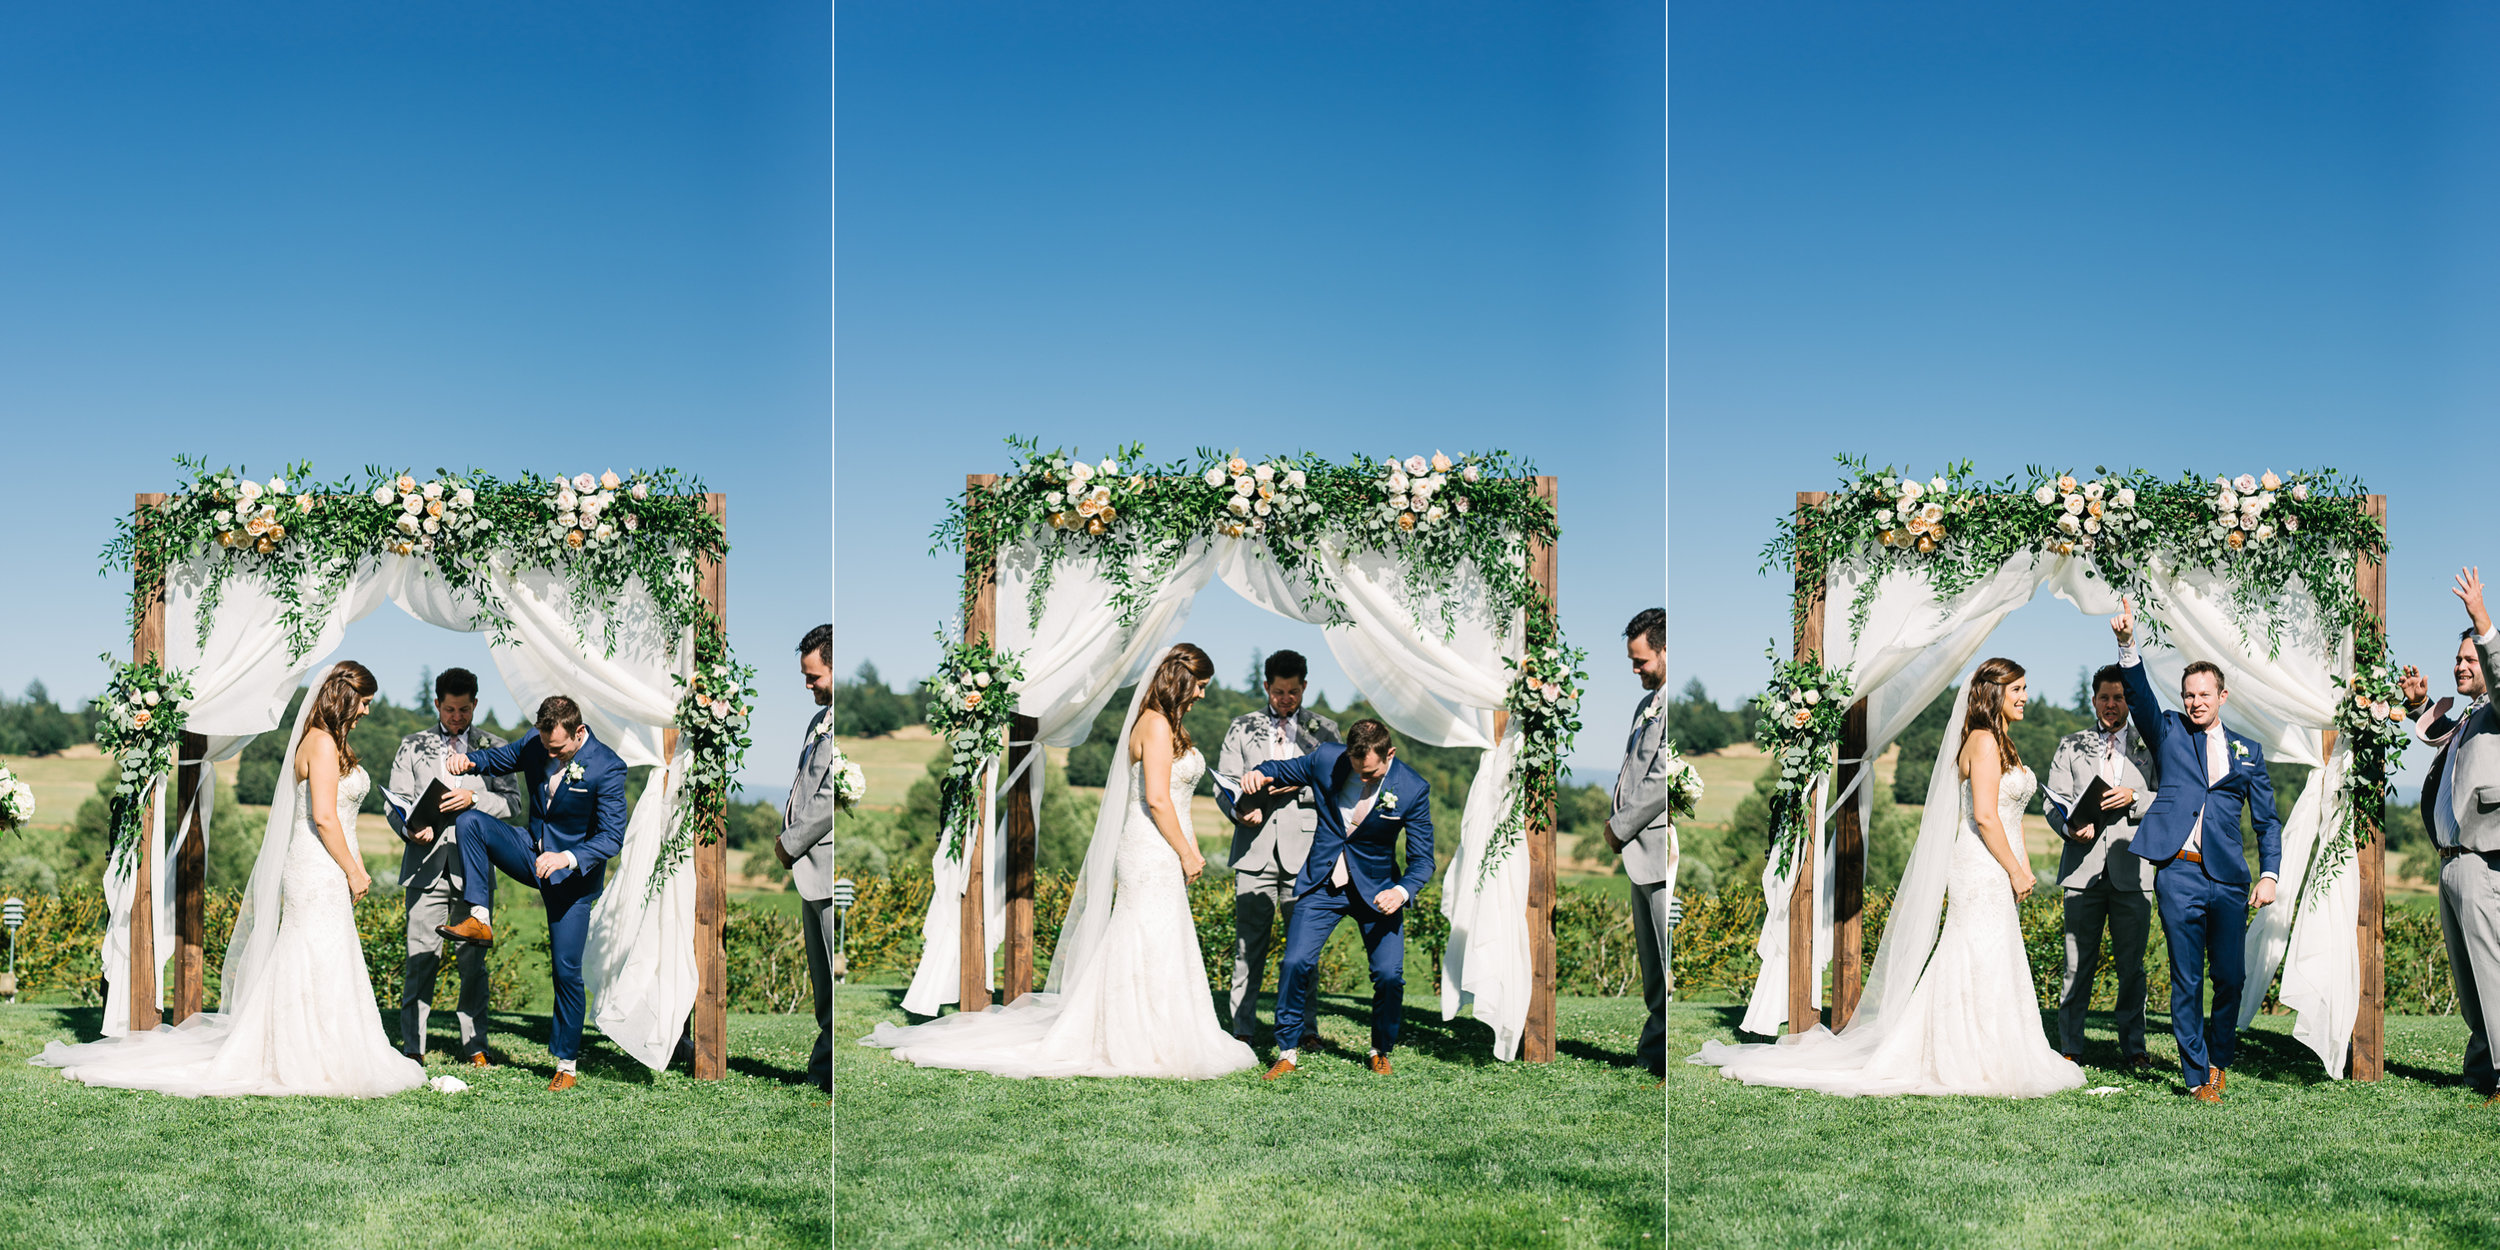 014-portland-wedding-photography-best-2018.jpg